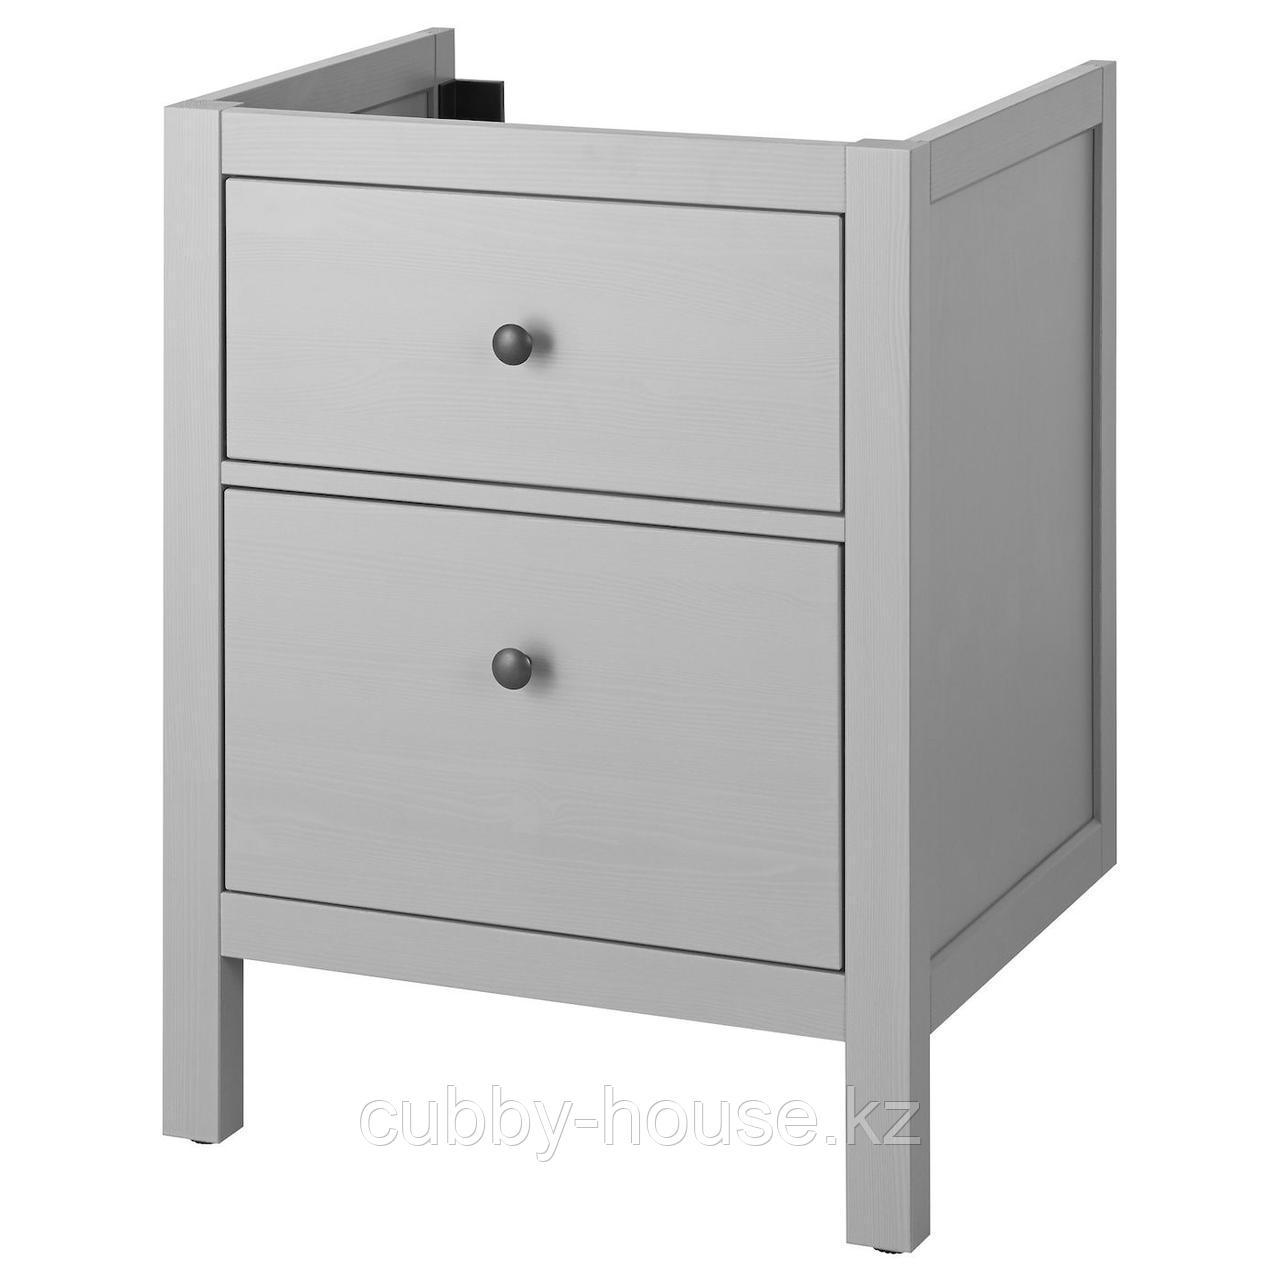 ХЕМНЭС Шкаф для раковины с 2 ящ, серый, 80x47x83 см